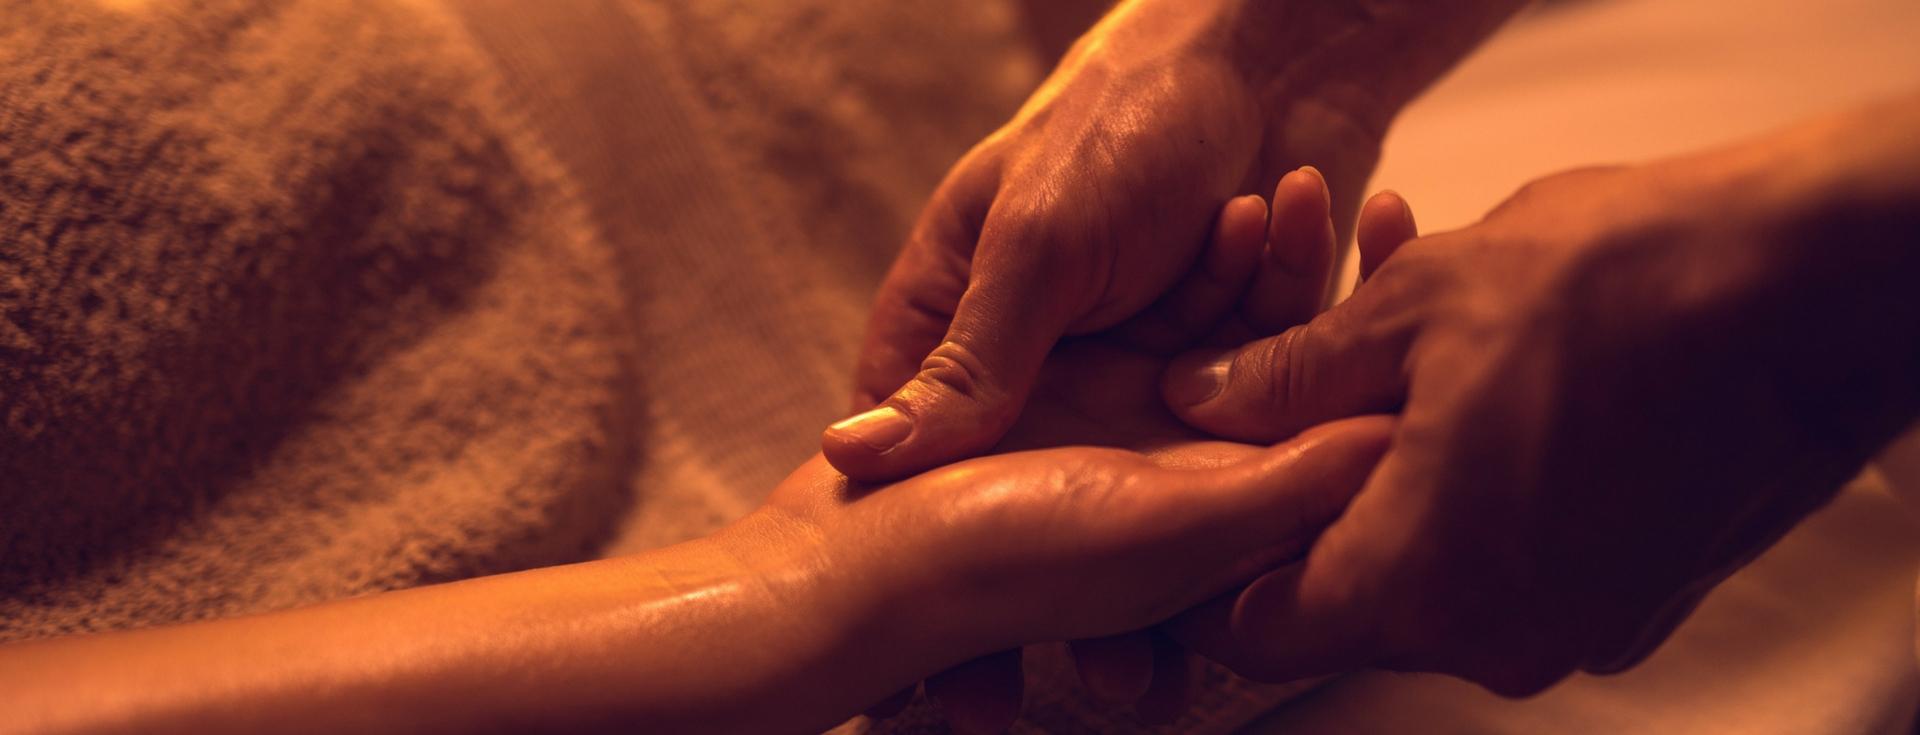 Massage and body treatments